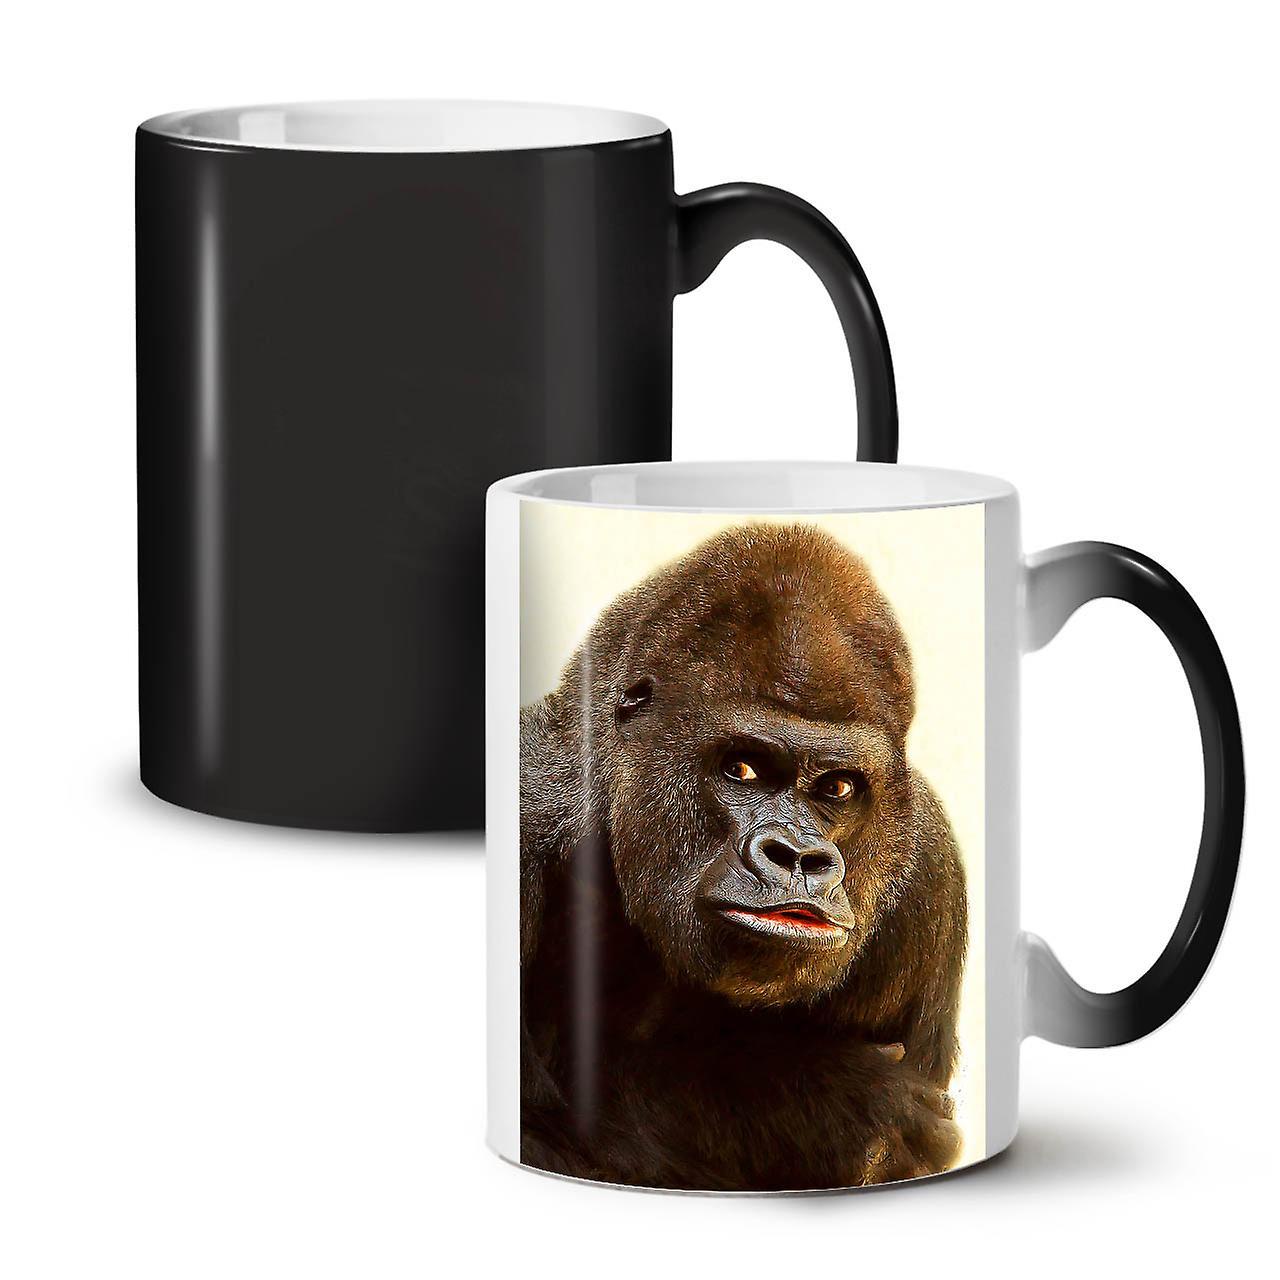 OzWellcoda 11 Colour Mug Monkey Photo Coffee Ceramic Tea New Black Changing 0XnwOP8k